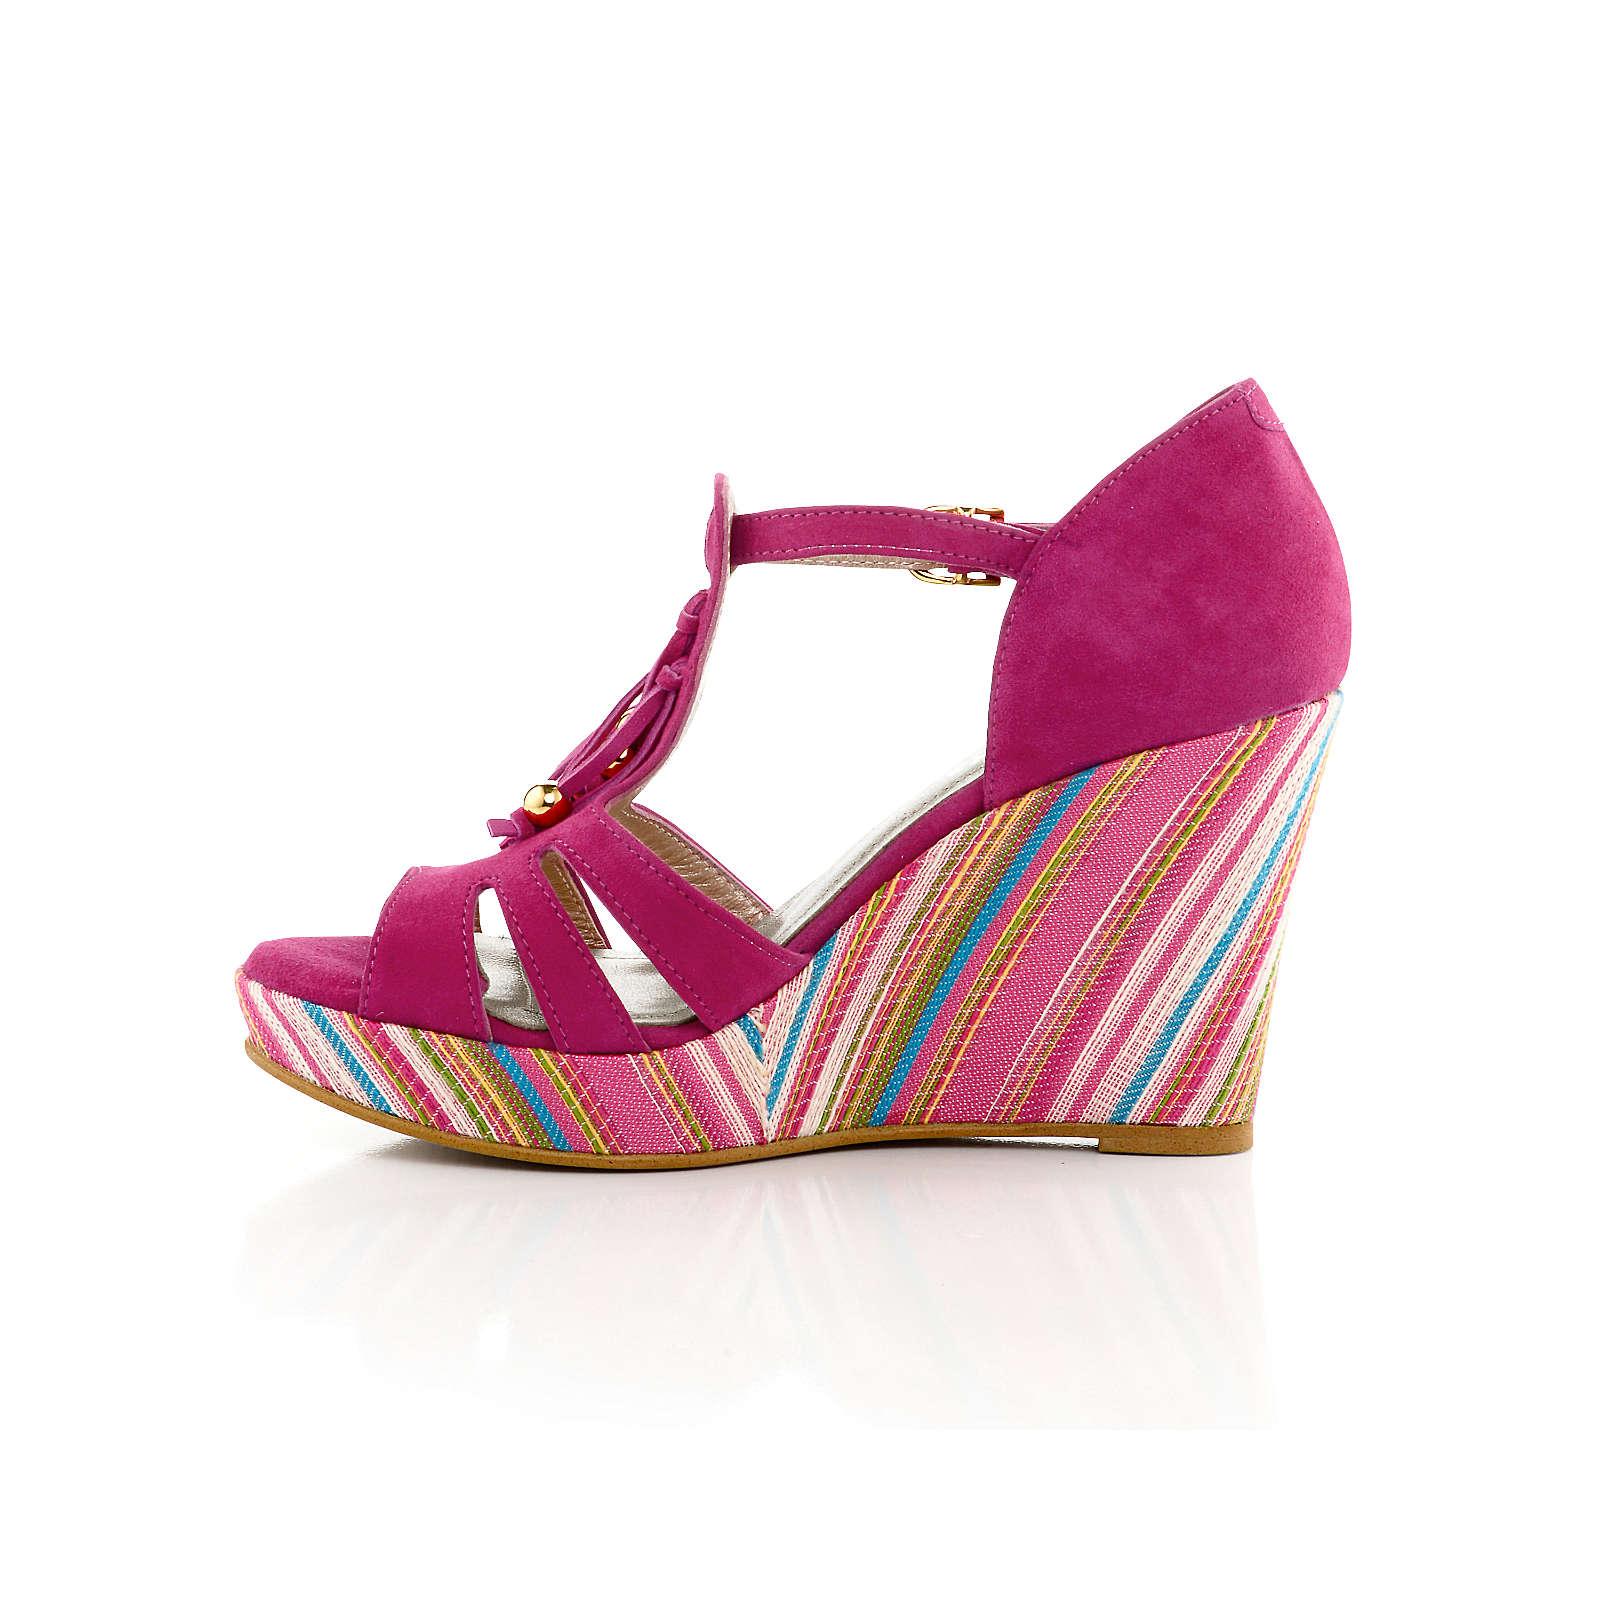 Alba Moda Sandalette mehrfarbig Damen Gr. 39